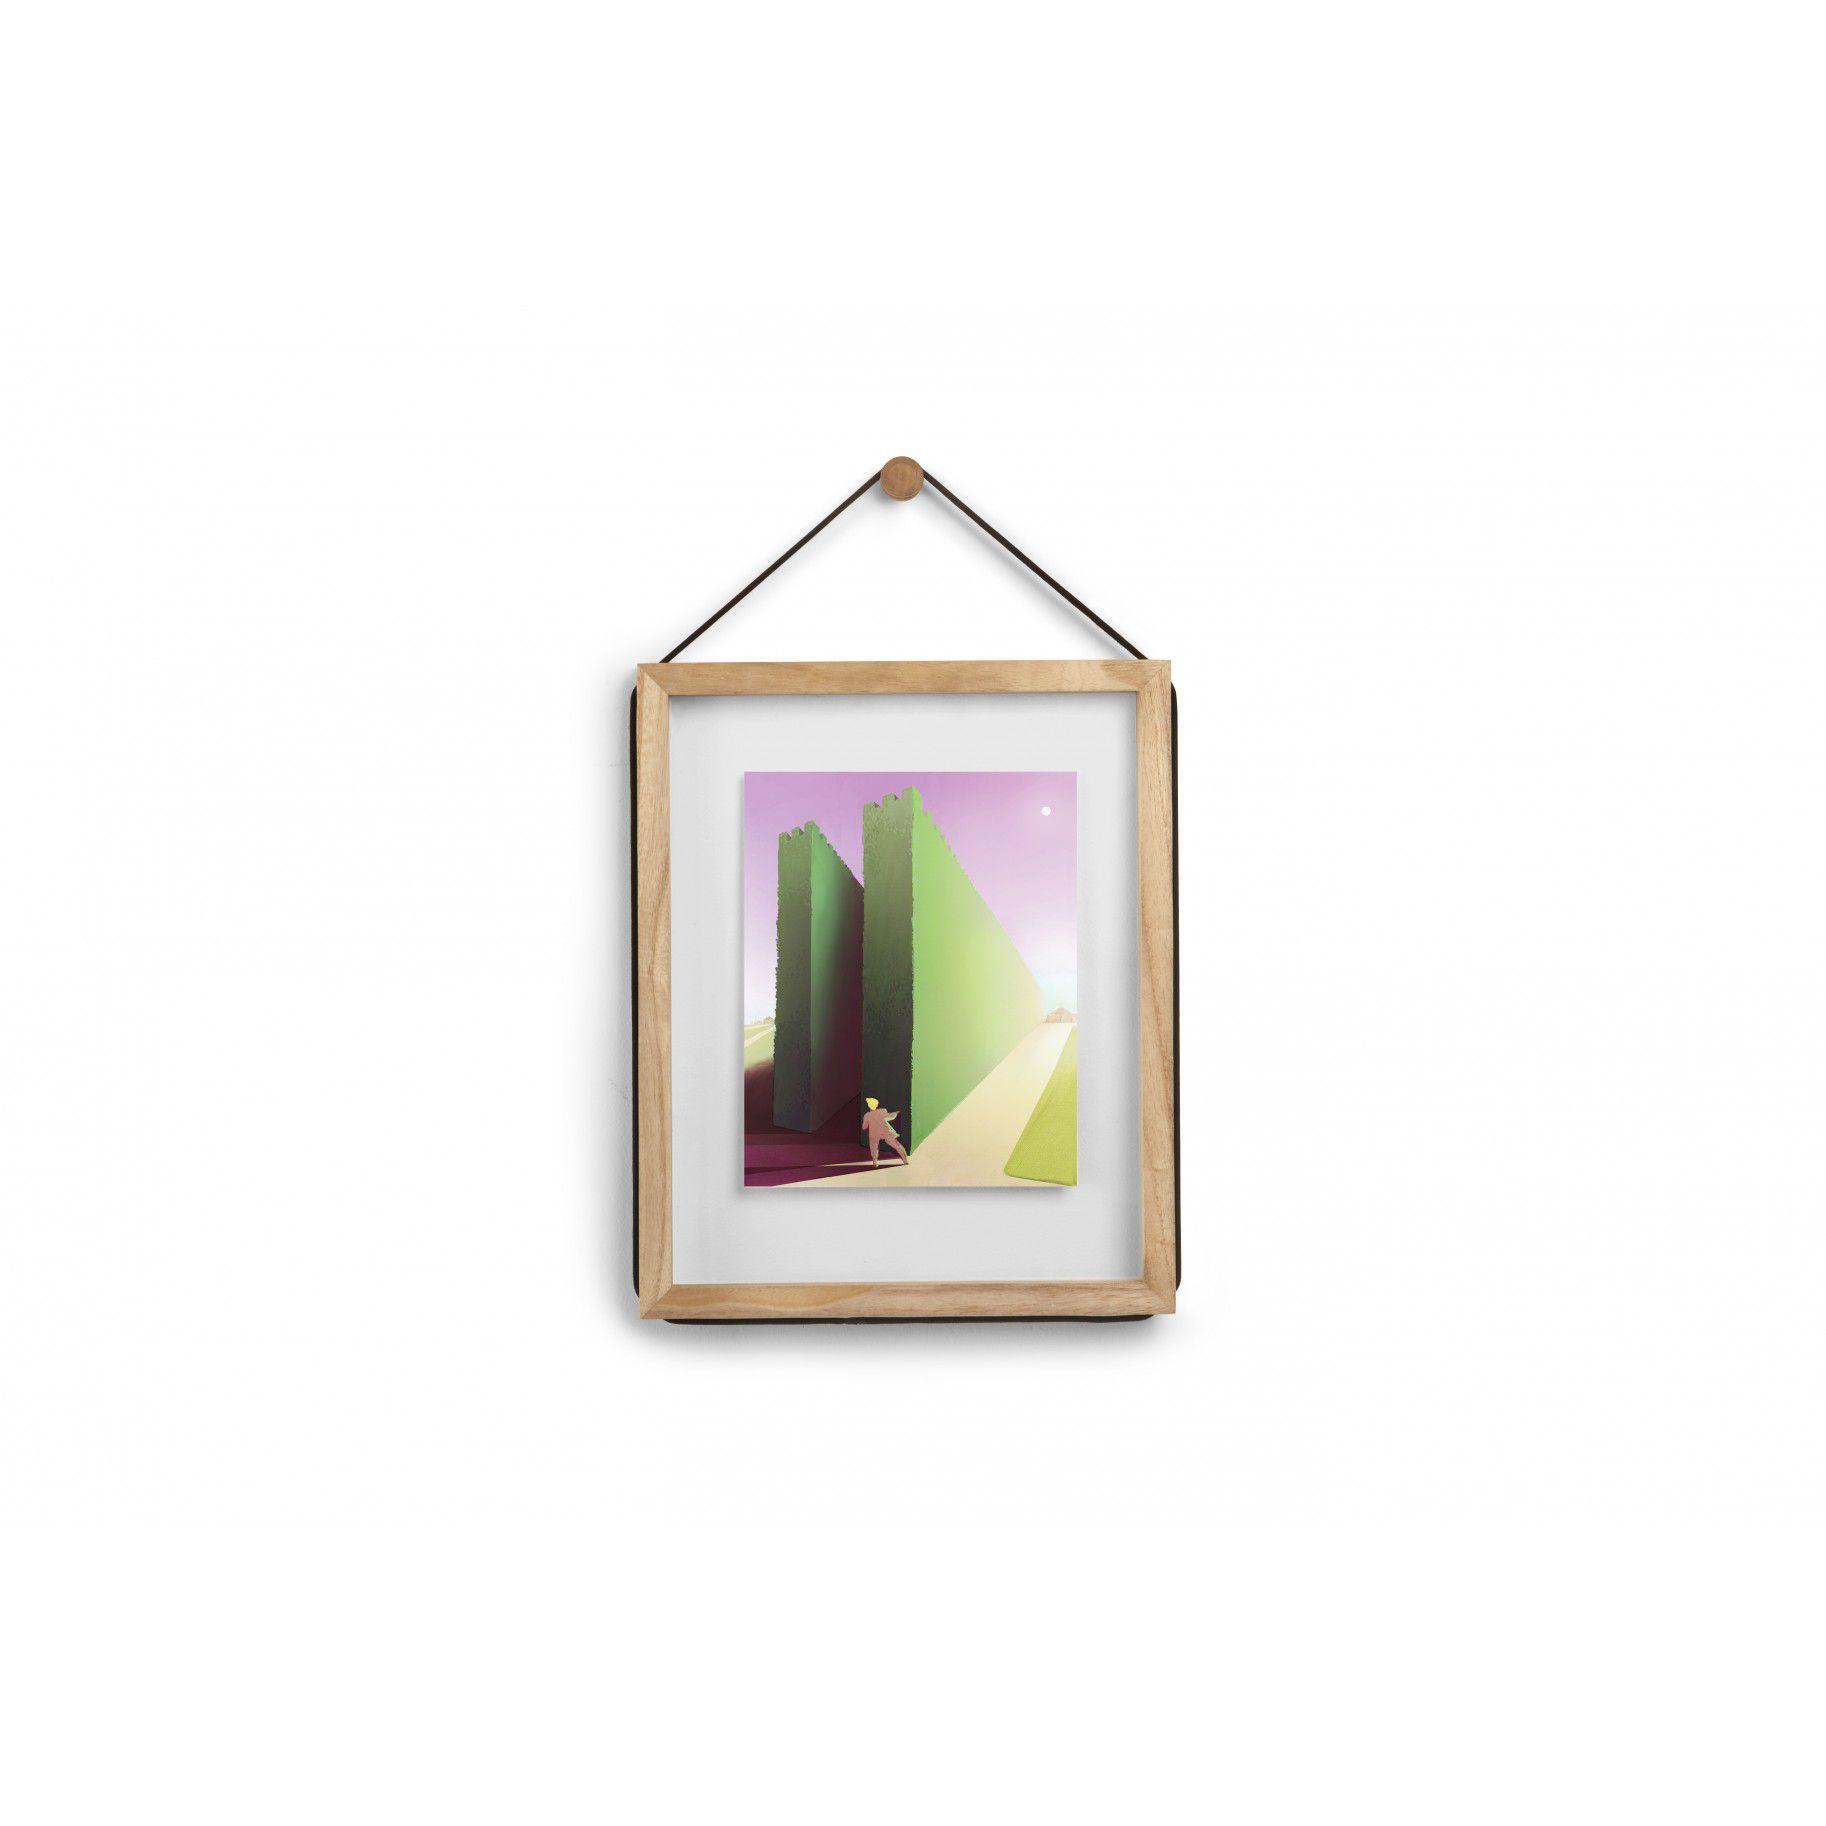 Porta Retrato Corda Foto 20x25 cm Natural - Umbra